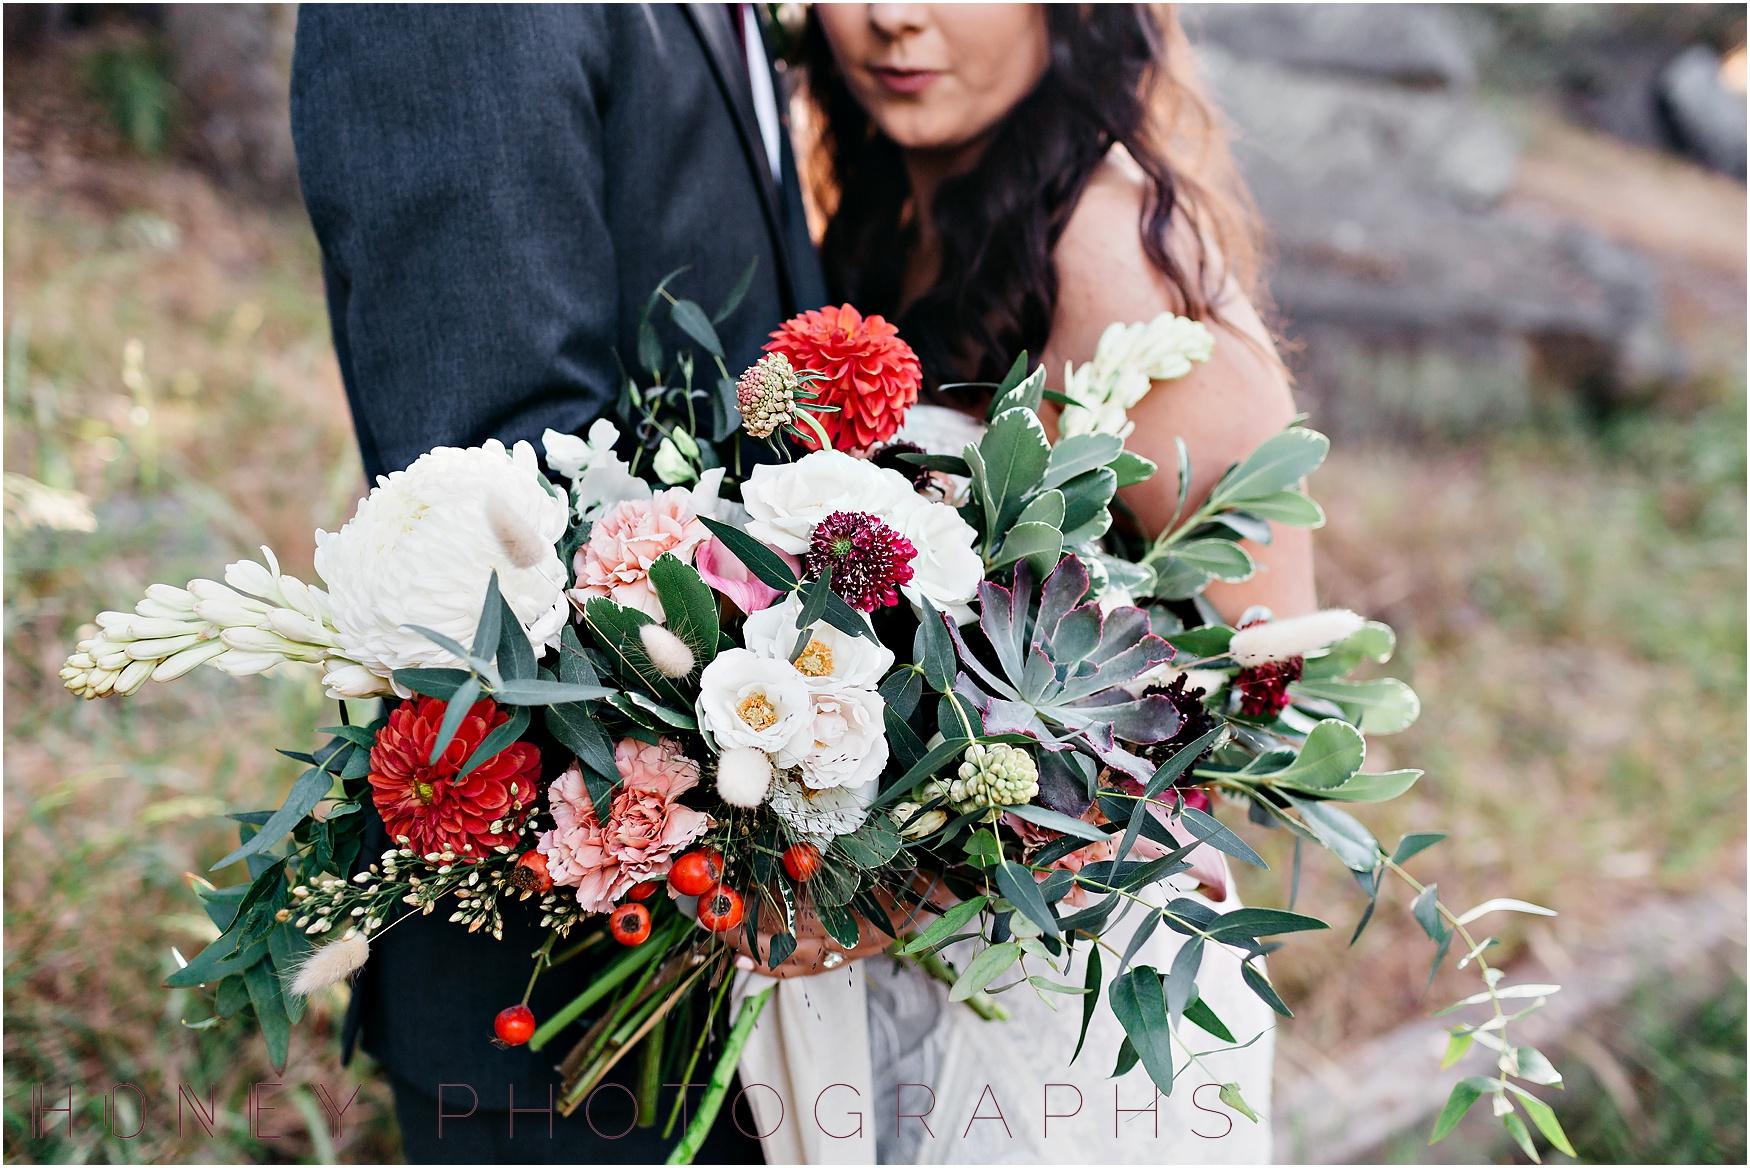 picnic-wedding-rustic-sweetheart-table-felicita-park-boho13.jpg